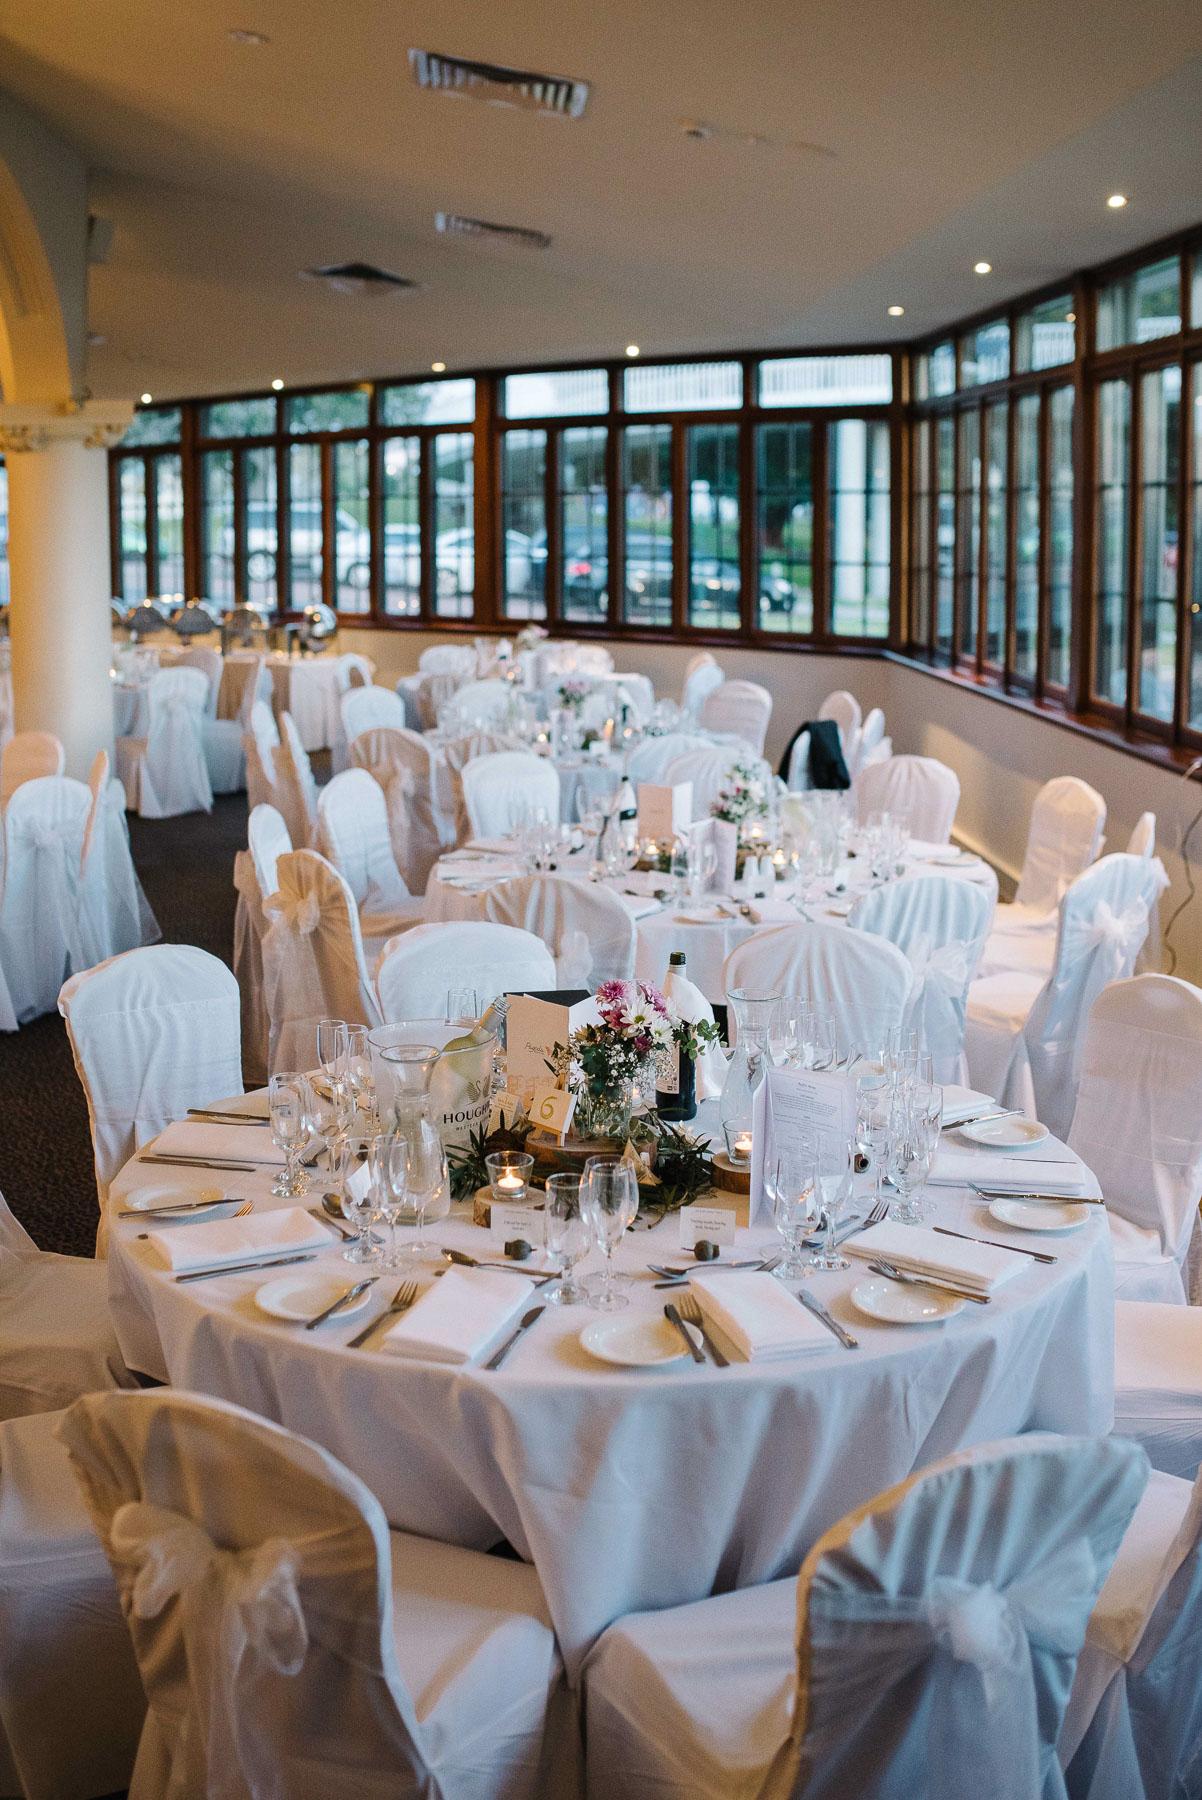 69-classic wedding reception table design perth.jpg